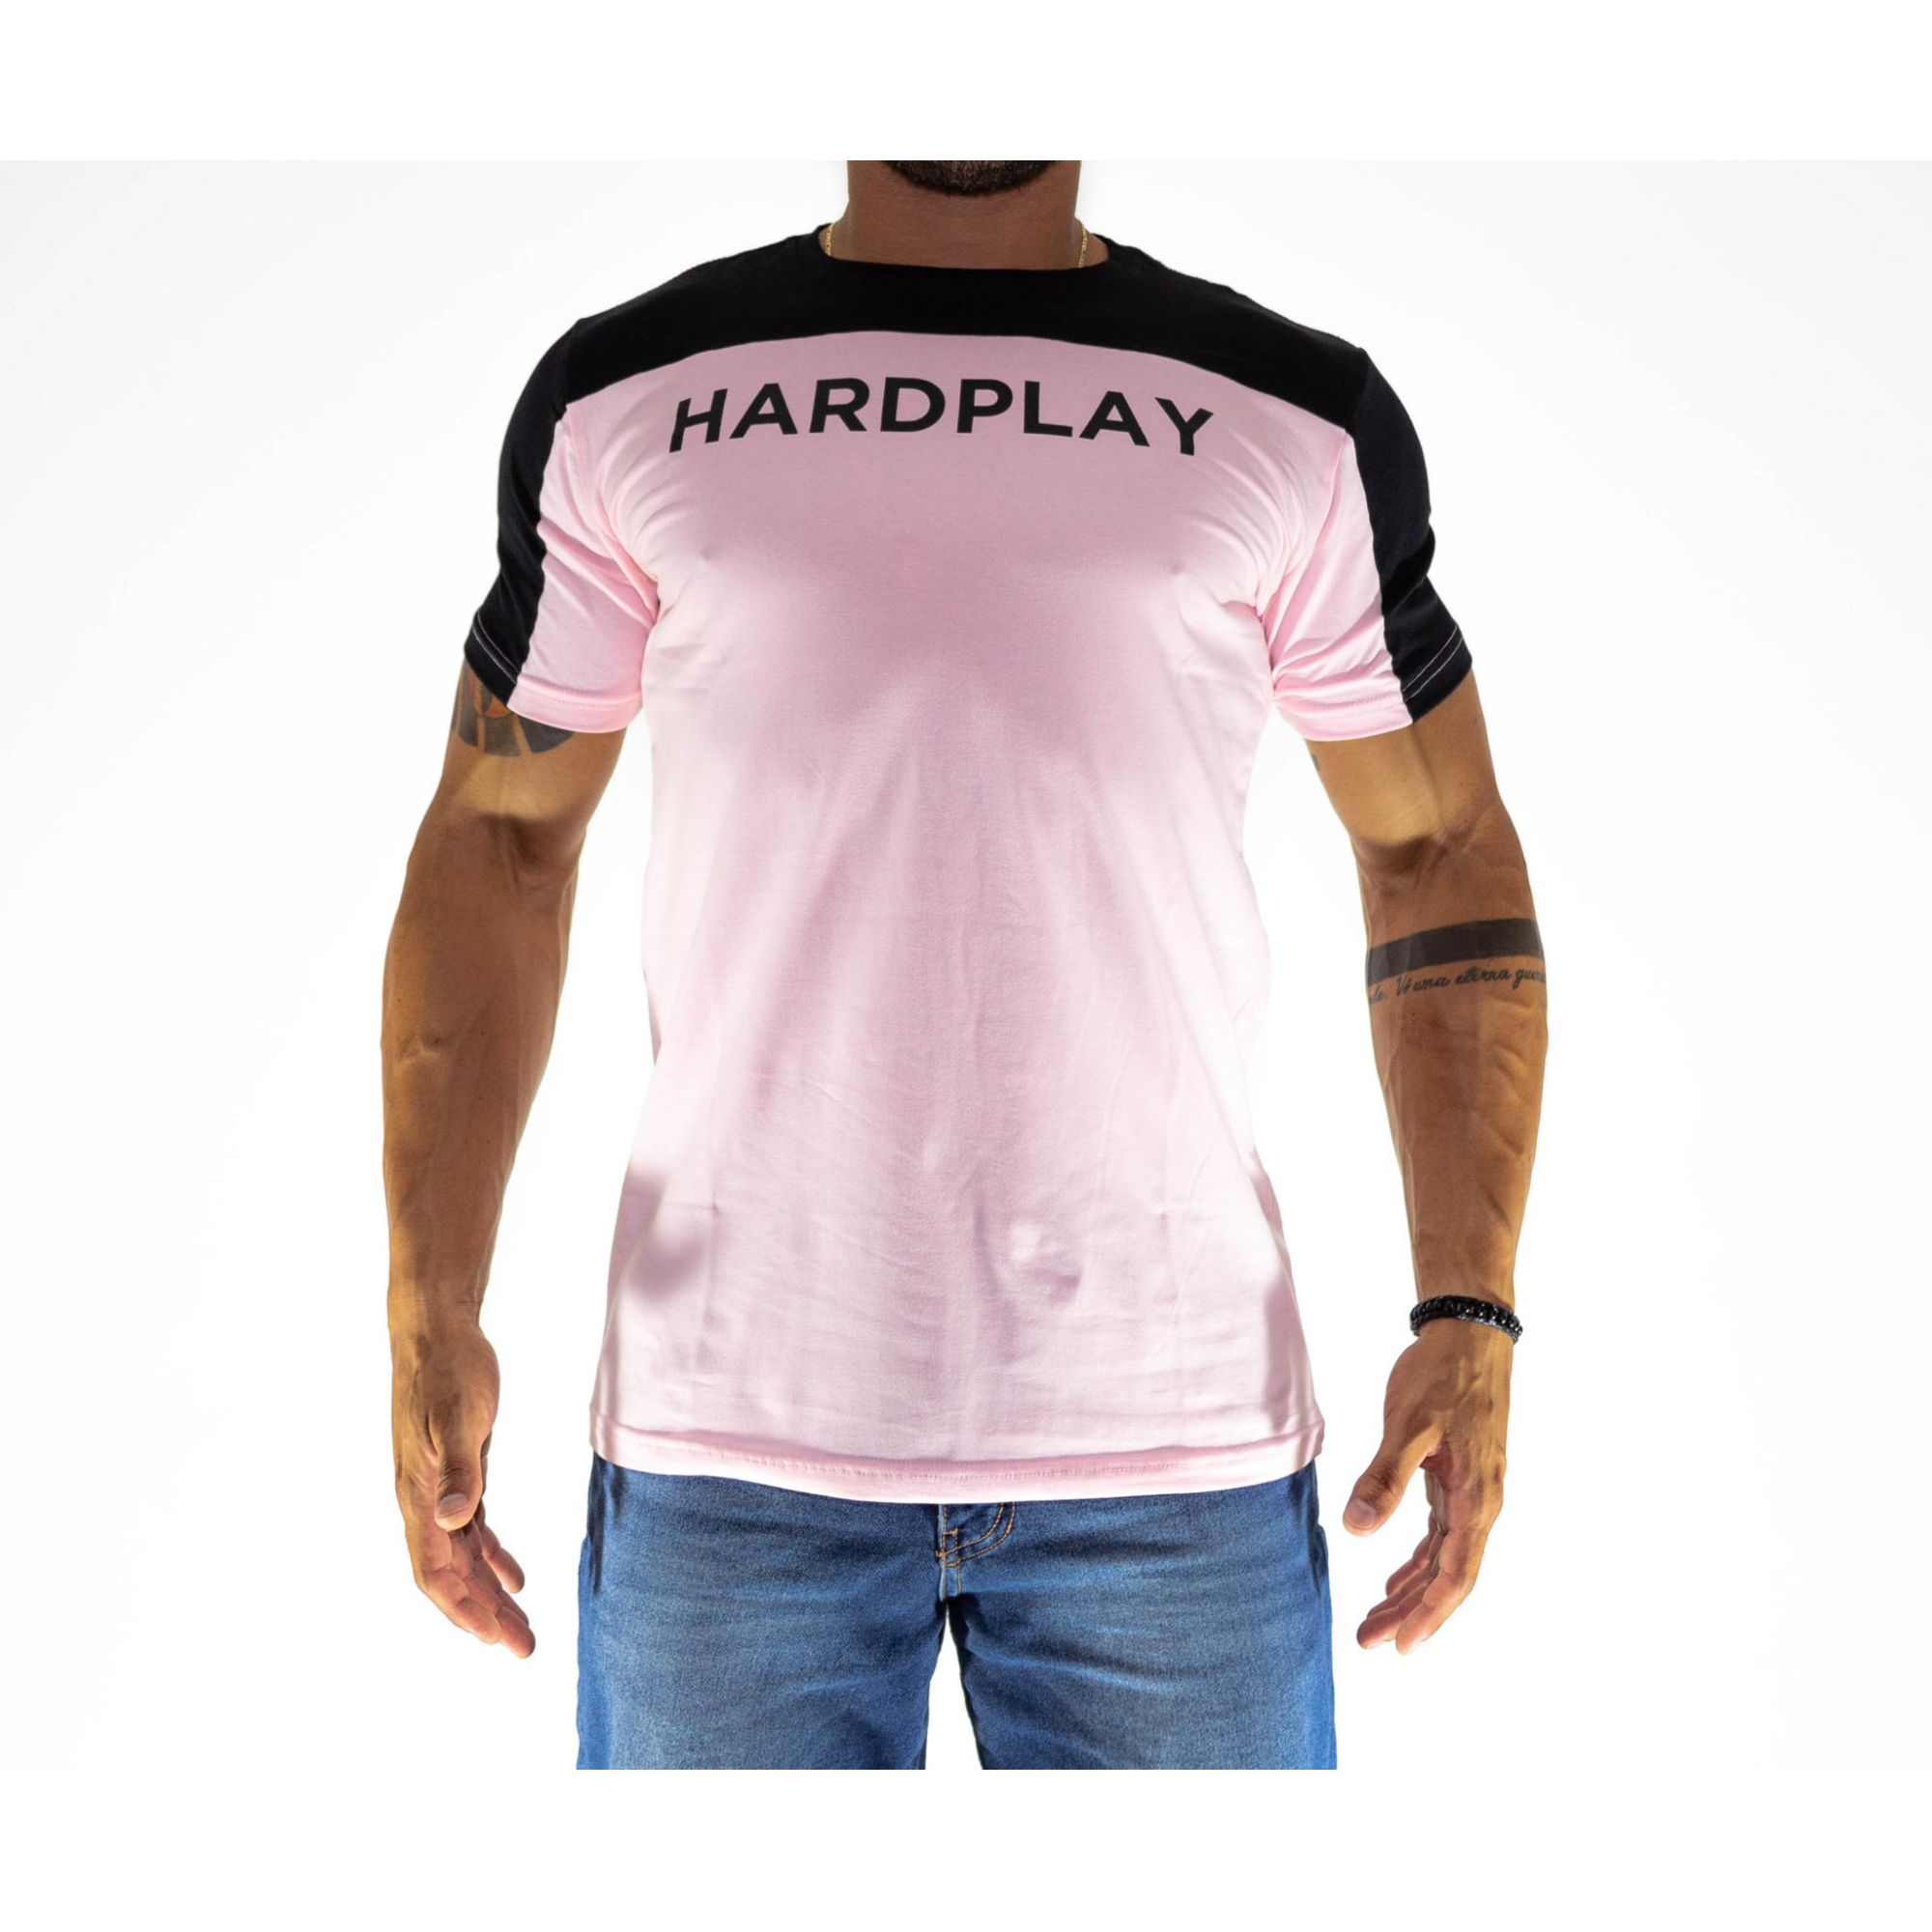 Camiseta HardPlay Recorte  Rosa e Preto